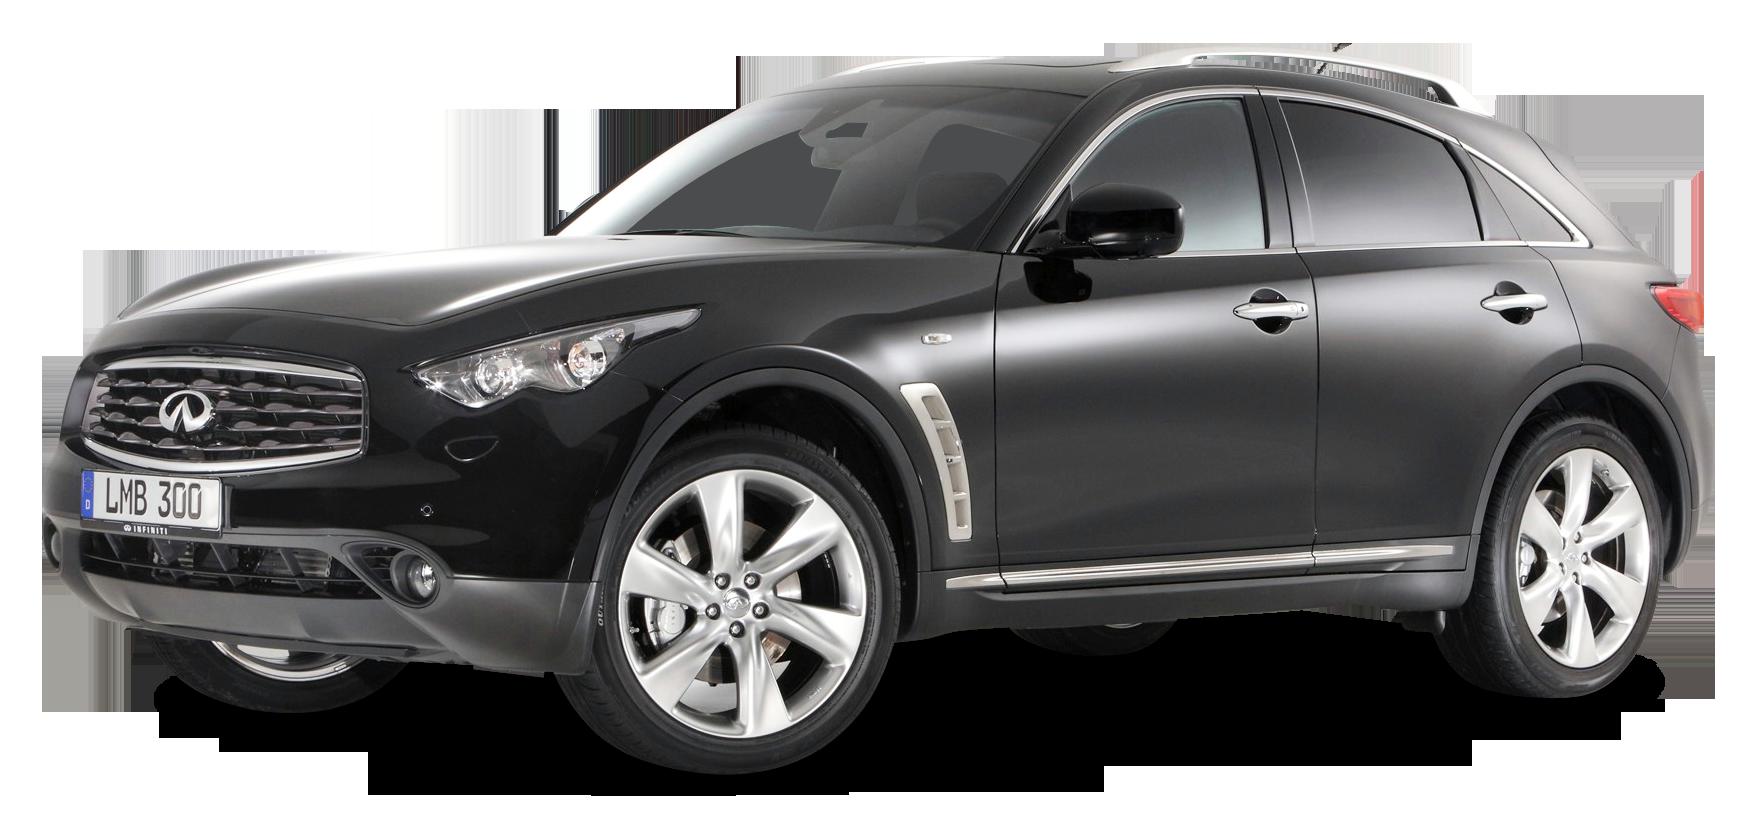 Infiniti FX30d S Black Car (With images) Black car, Car